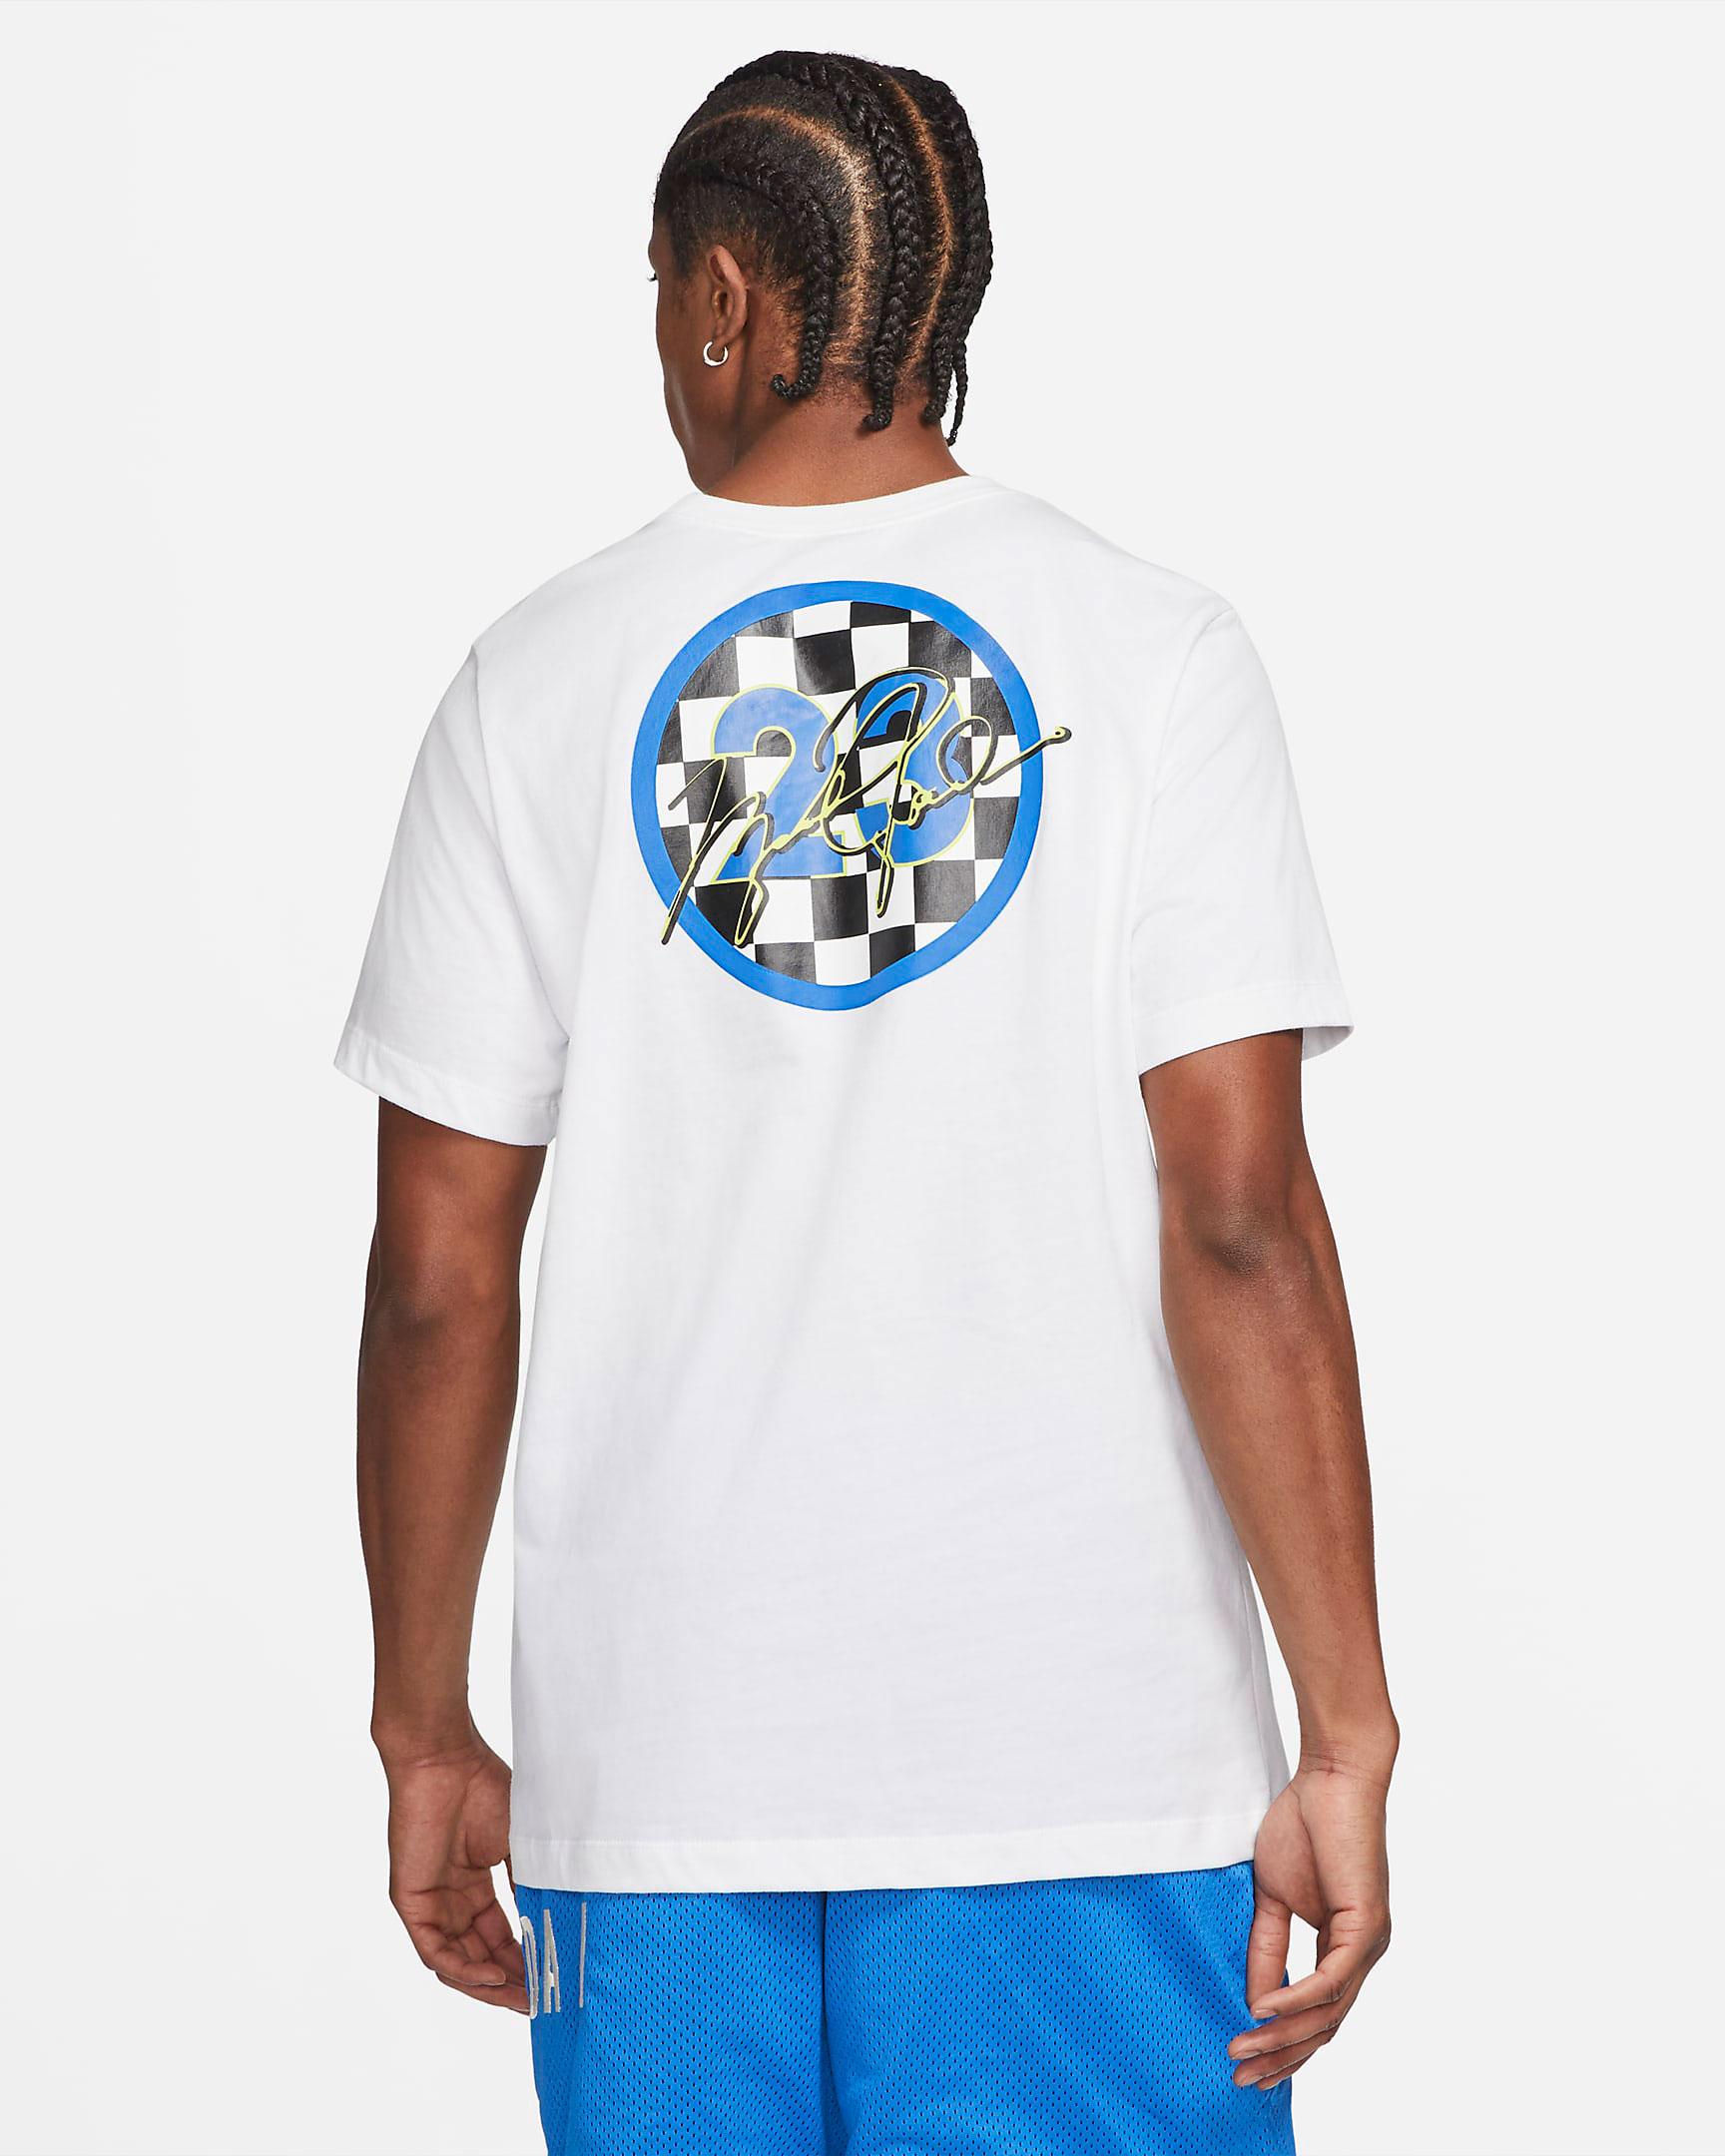 air-jordan-5-stealth-2021-shirt-2